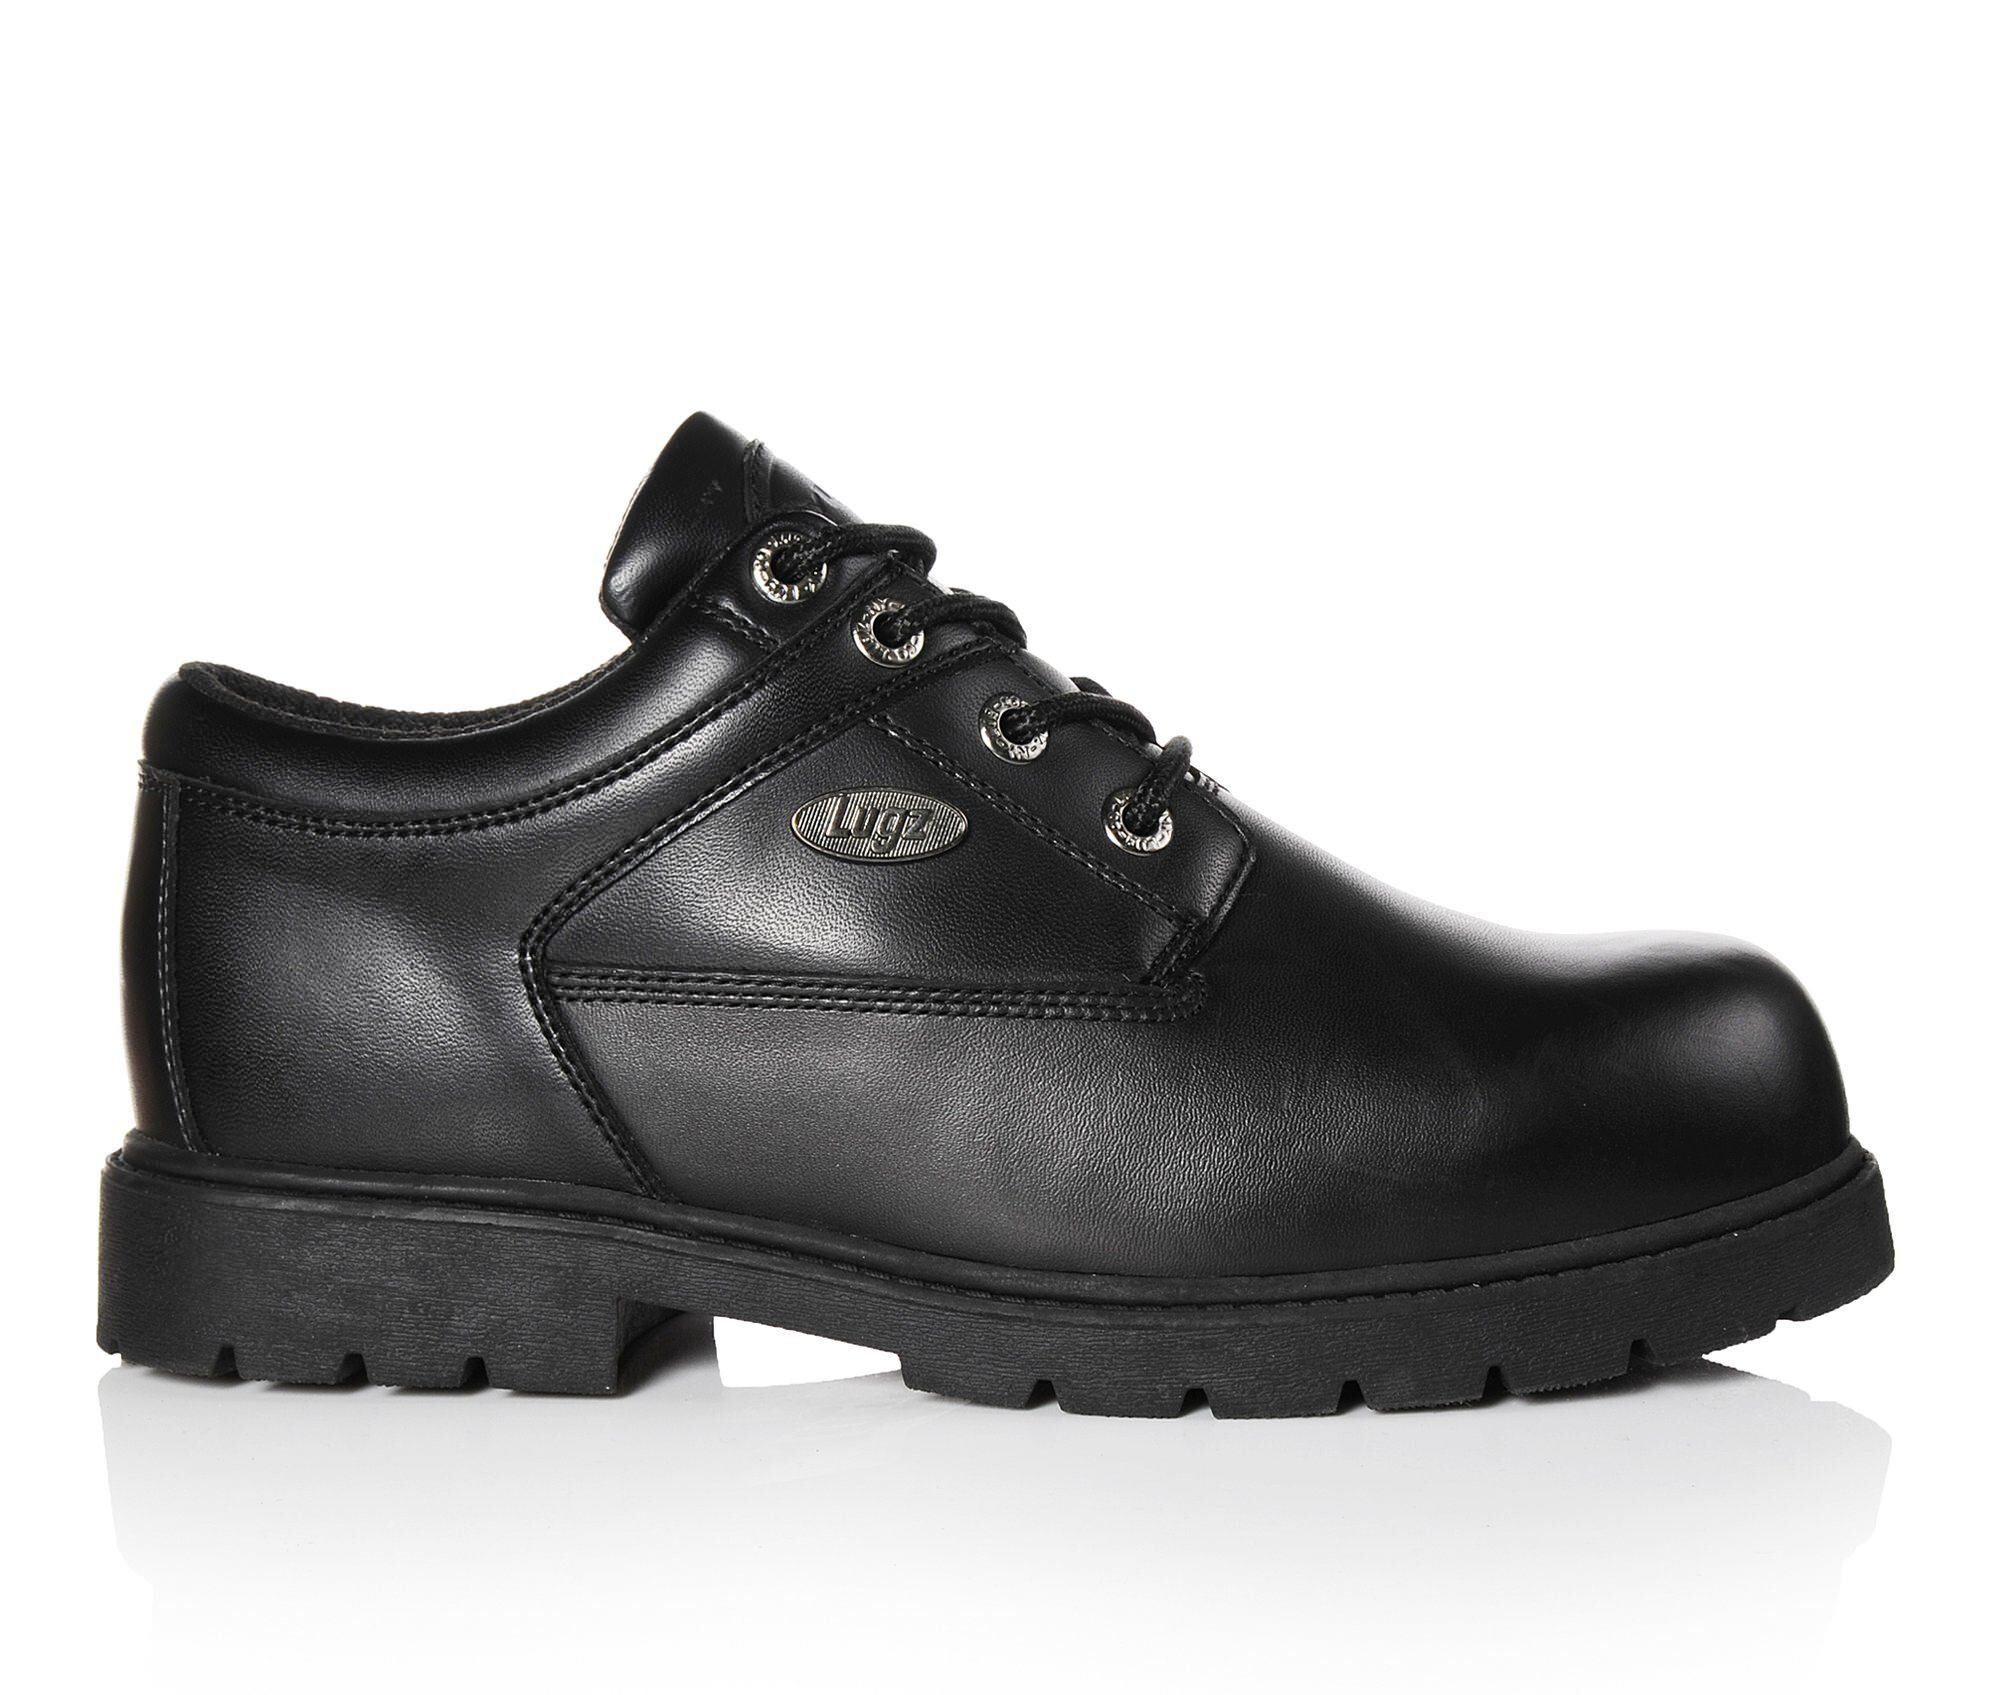 Men's Lugz Savoy Slip Resistant Safety Shoes Black